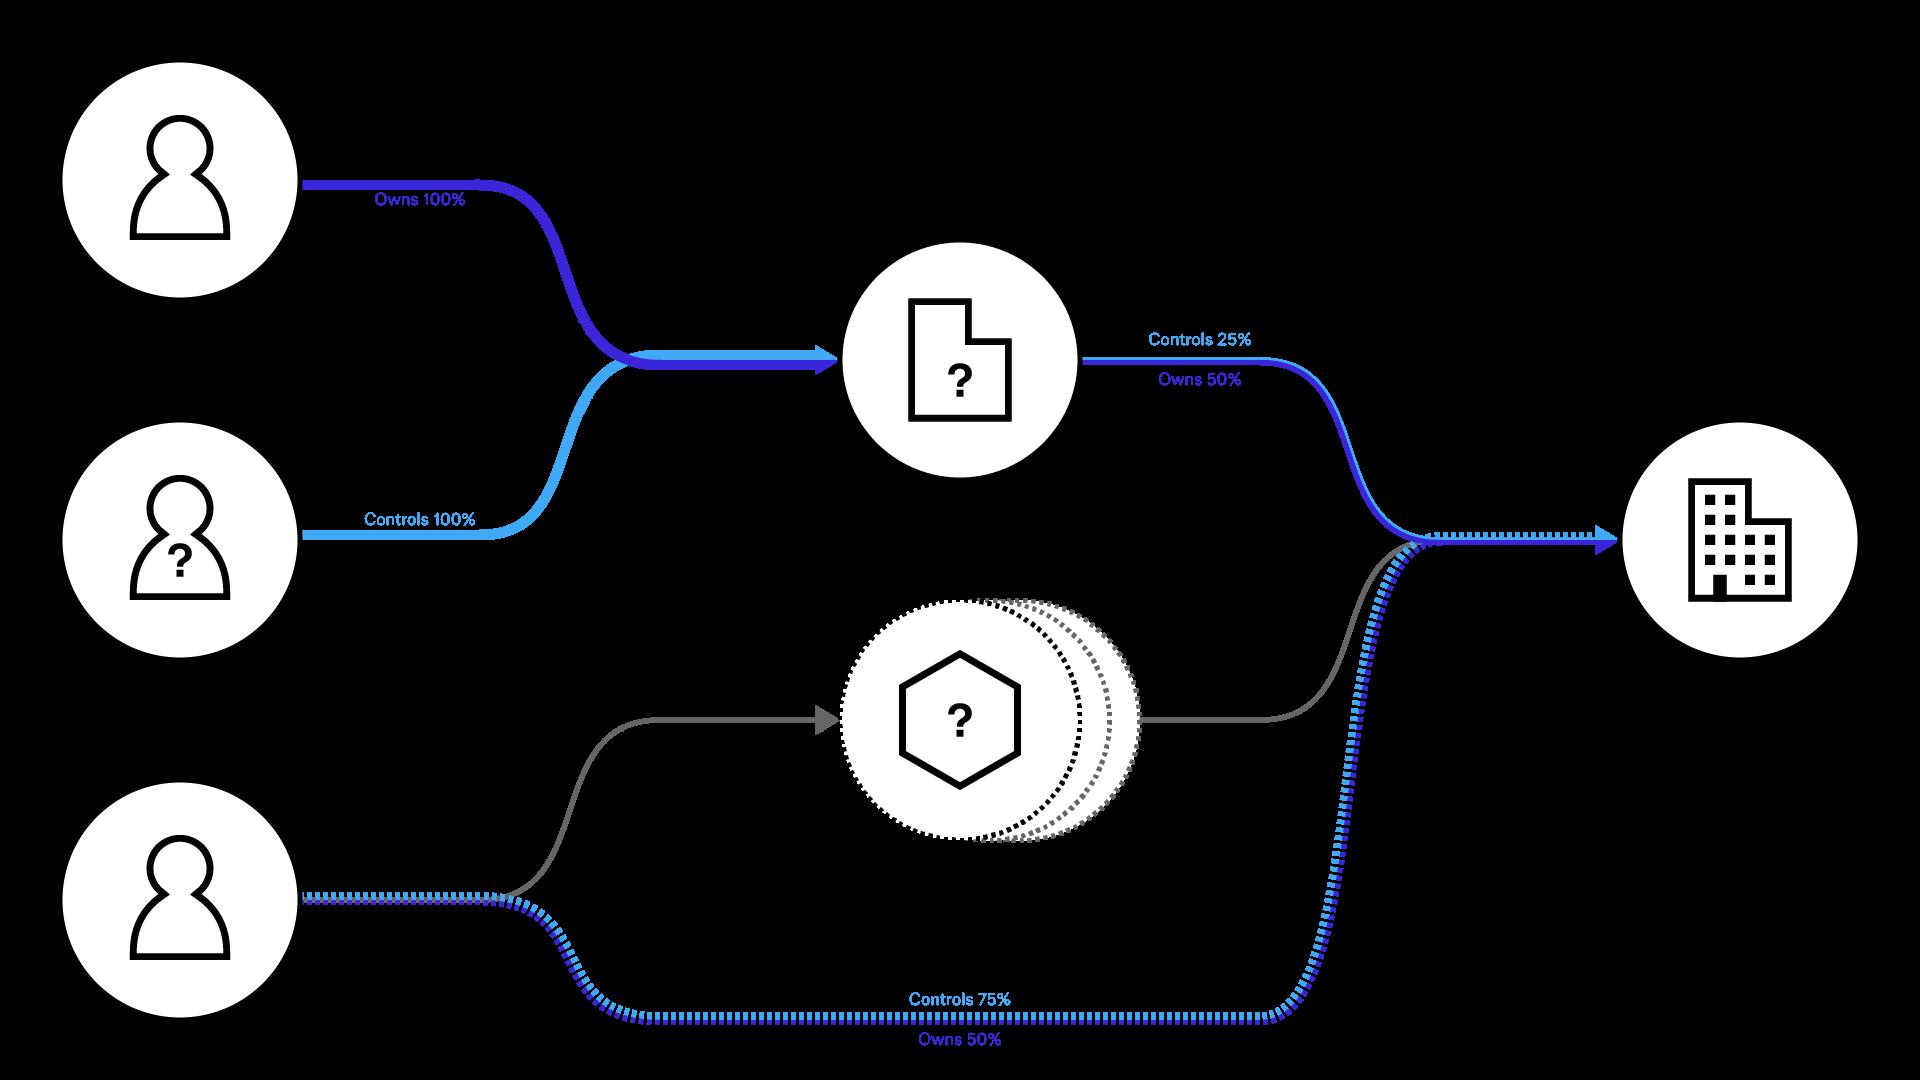 Example of a BOVS diagram